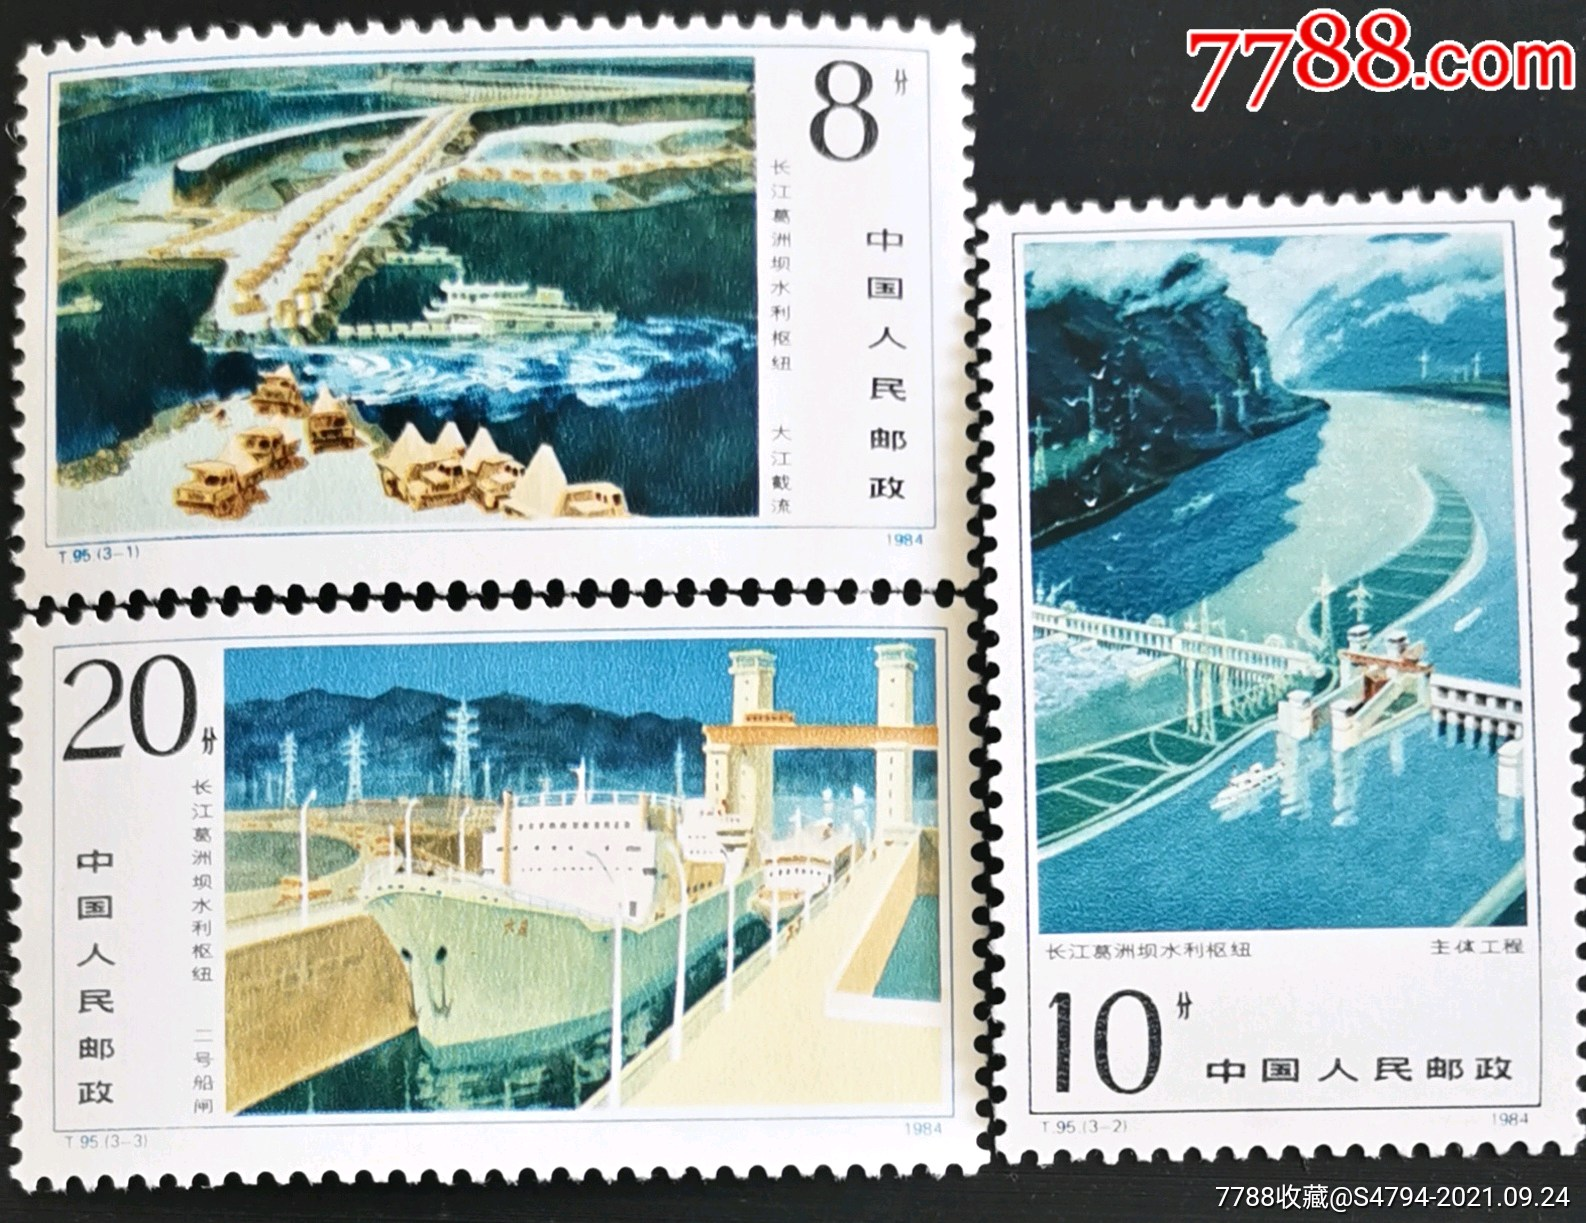 T95《葛州坝水利工程》全新邮票_价格1元【寻奇苑】_第1张_